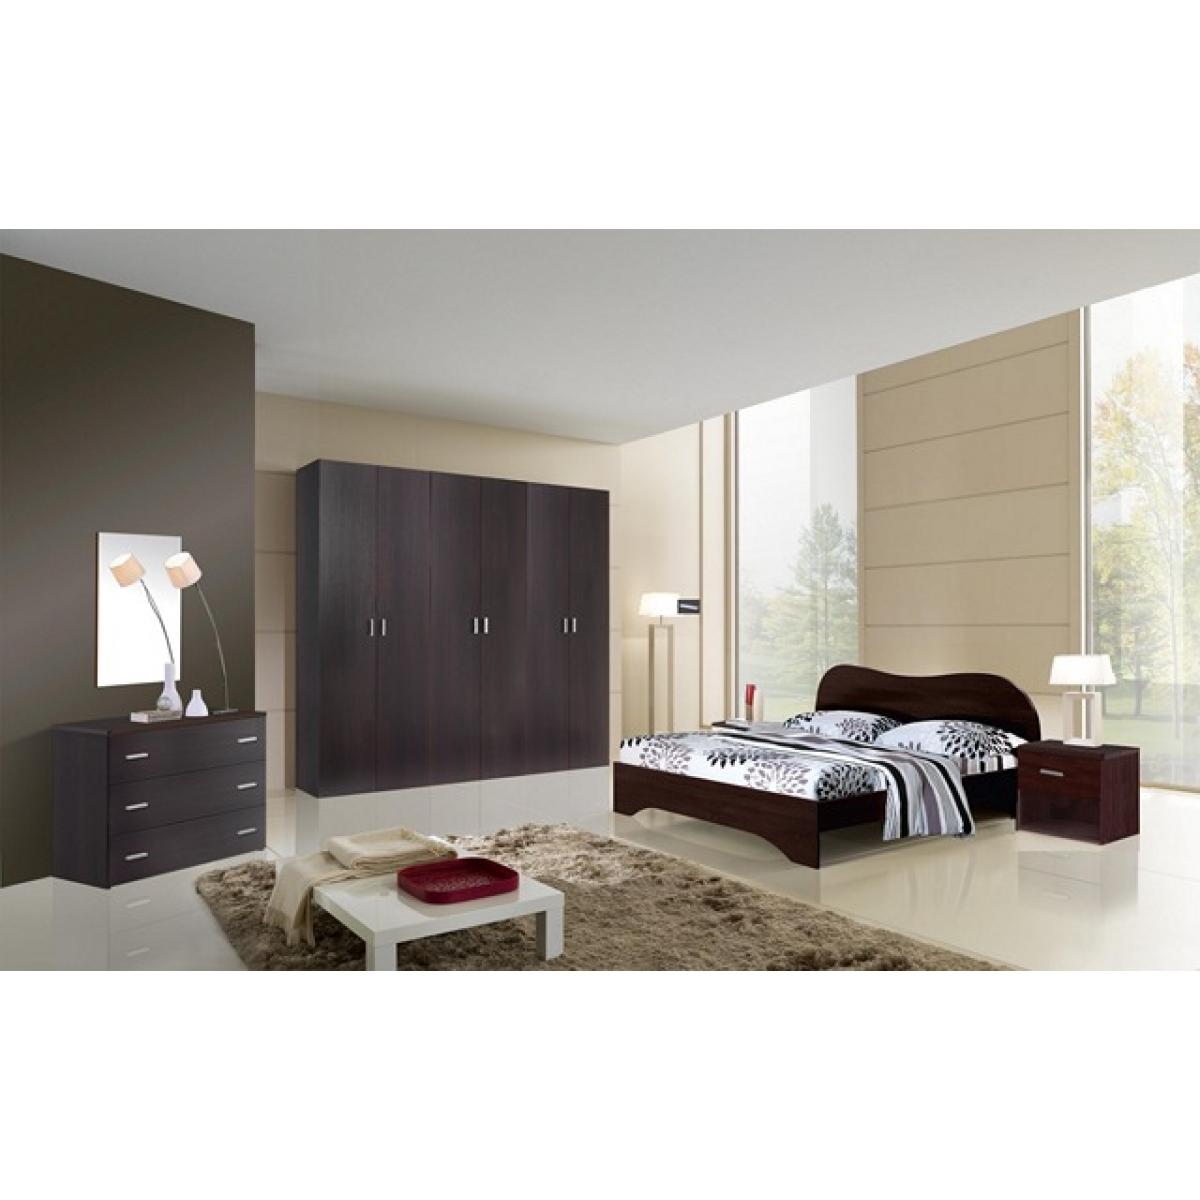 Beautiful camera da letto weng gallery acrylicgiftware - Camera da letto ...